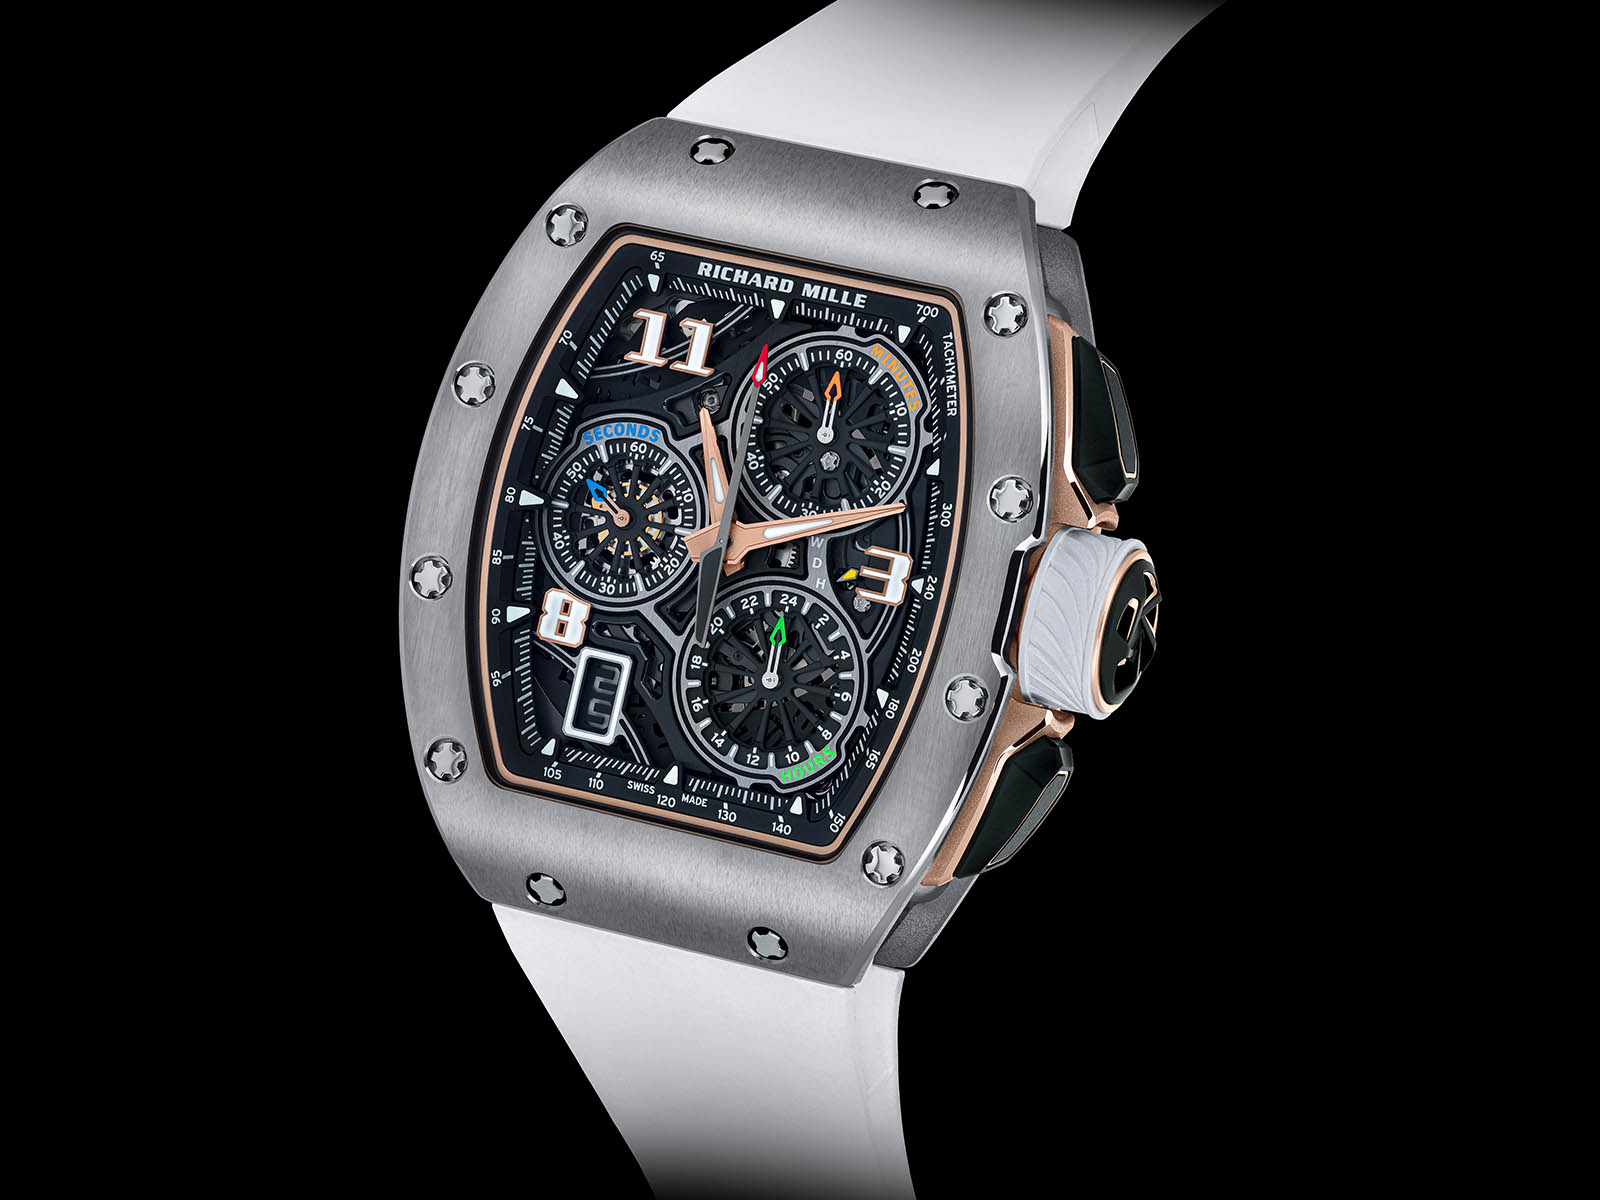 richard-mille-rm-72-01-titanium-2.jpg